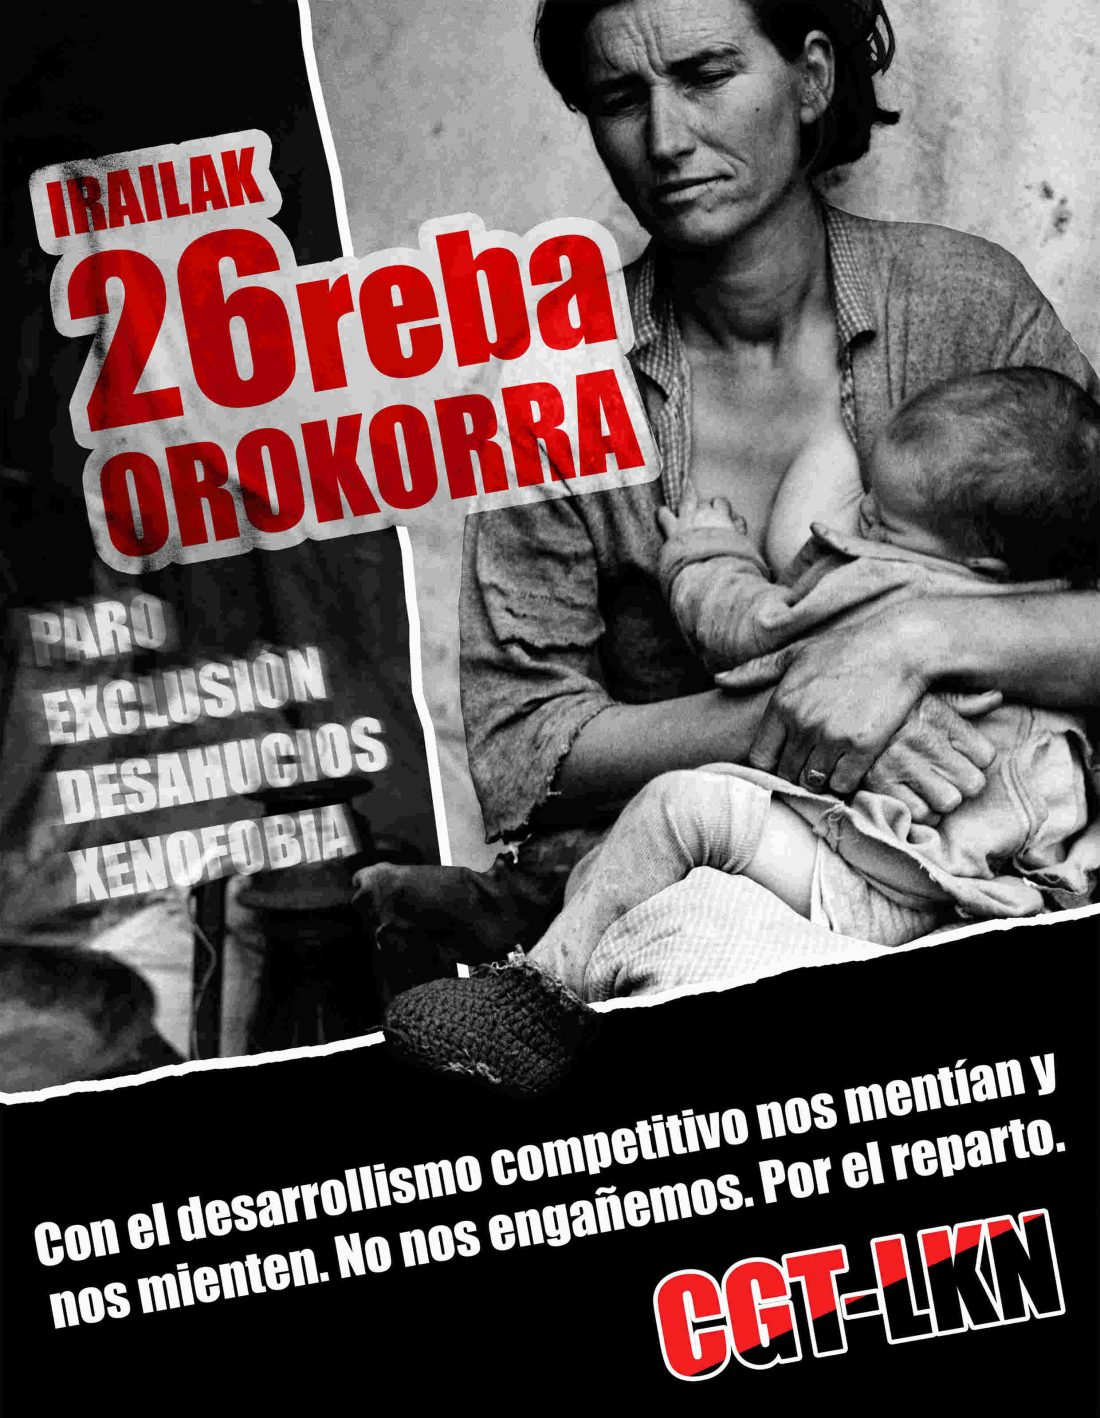 Euskadi. Huelga General 26 septiembre – Iraliak 26 Greba Orokorra